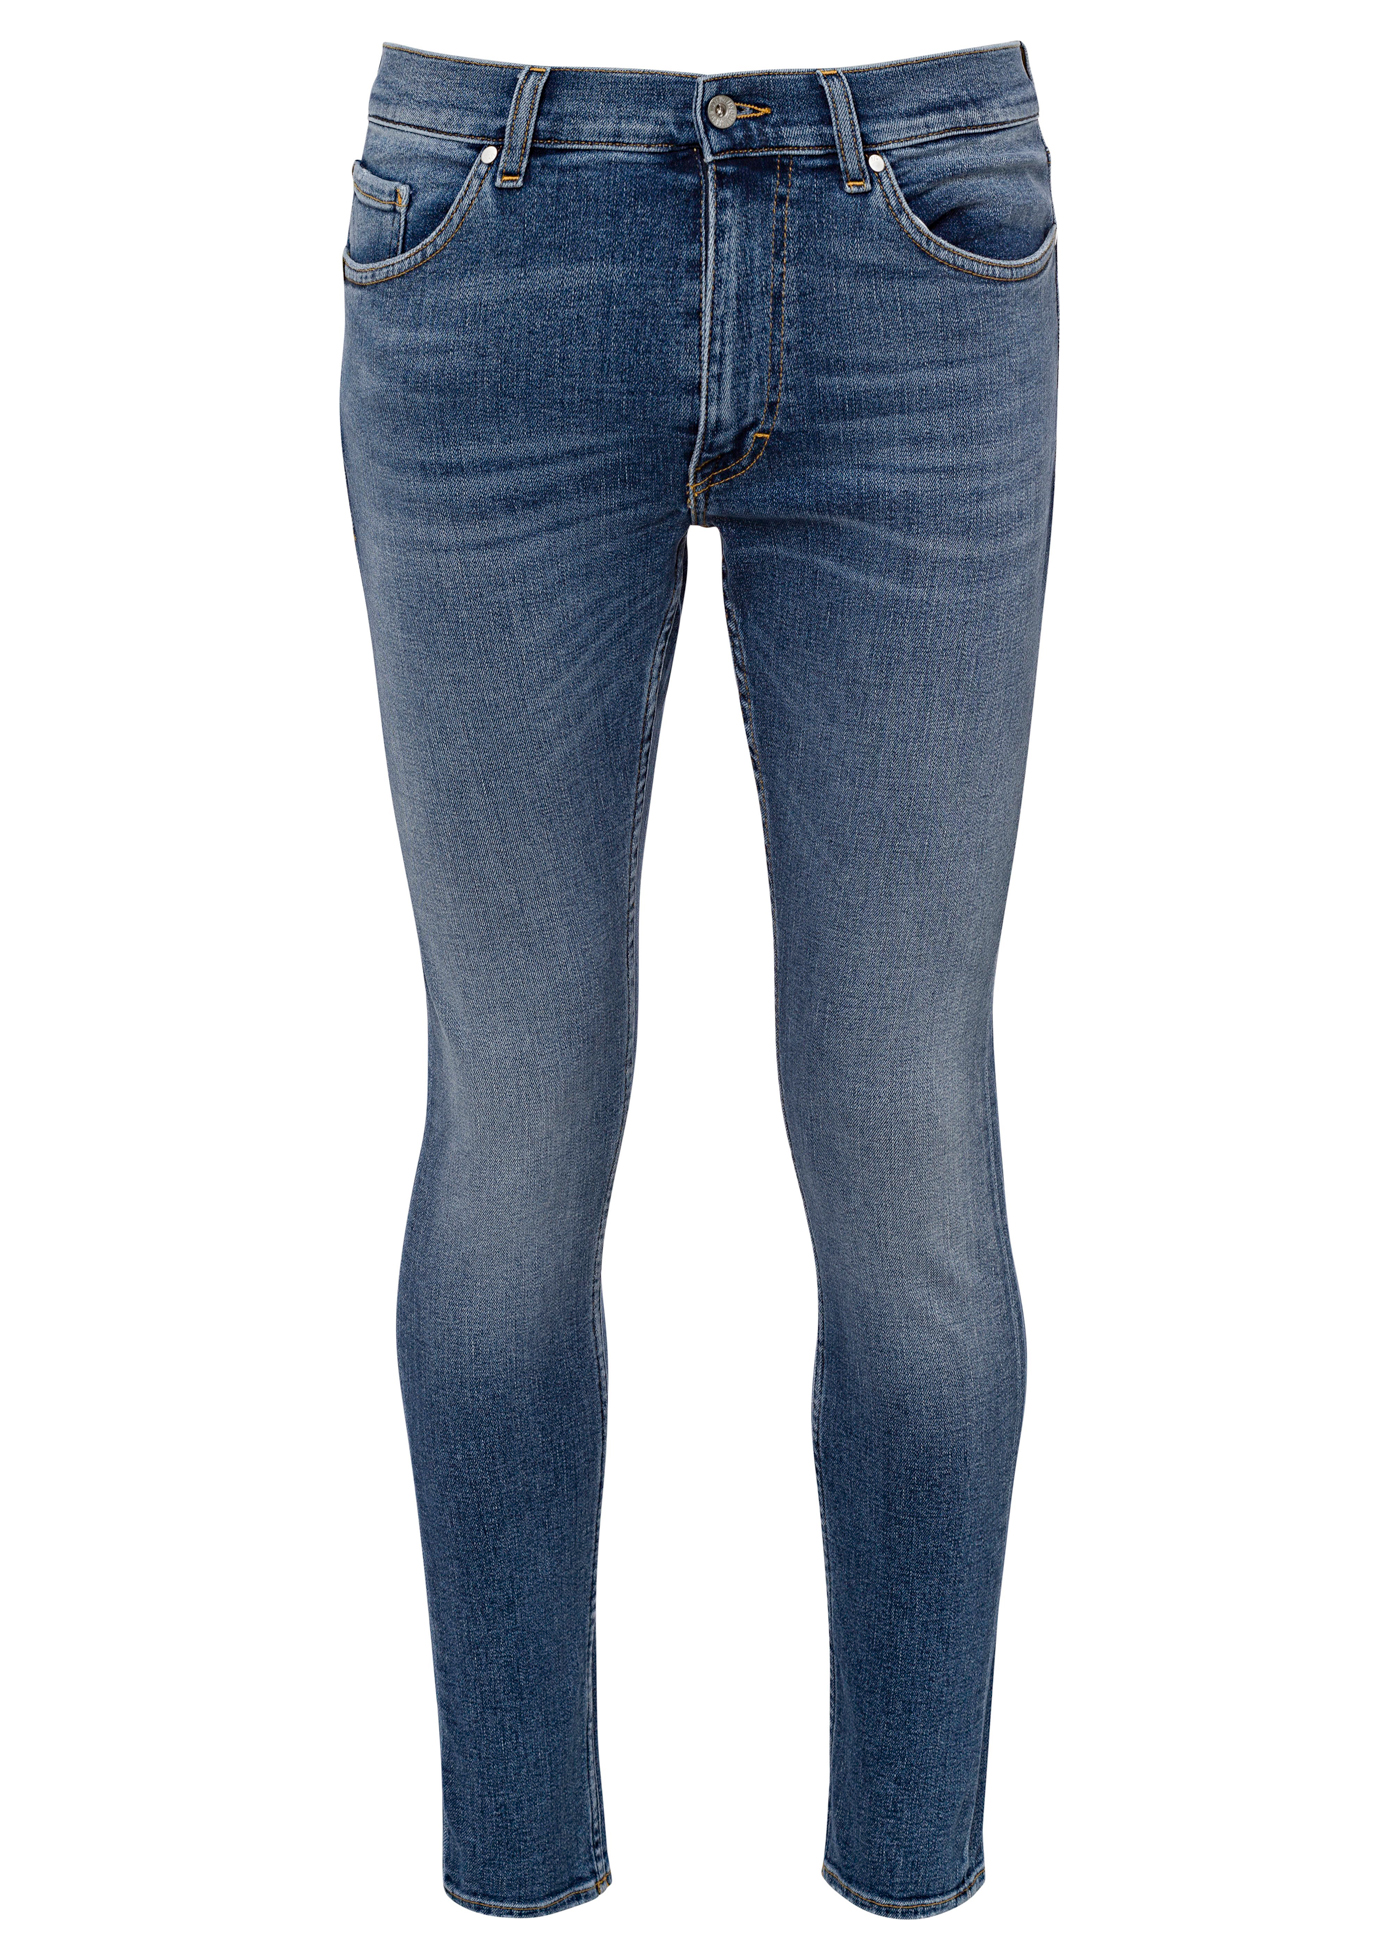 EVOLVE Jeans male 21F 36 image number 0